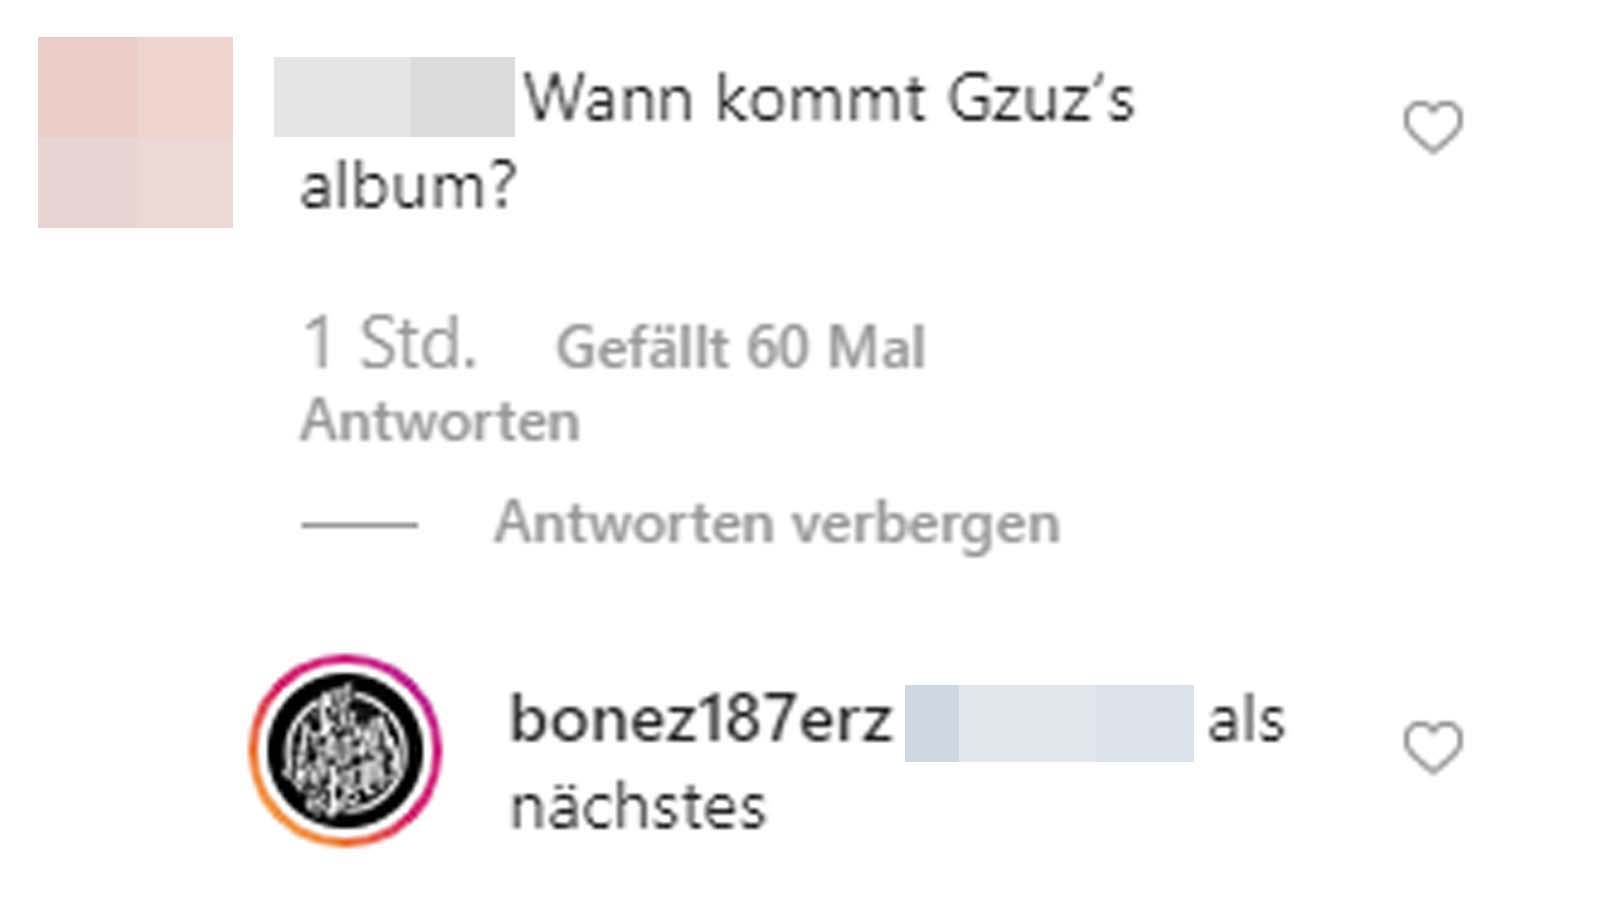 Bonez MC kündigt Gzuz-Album an